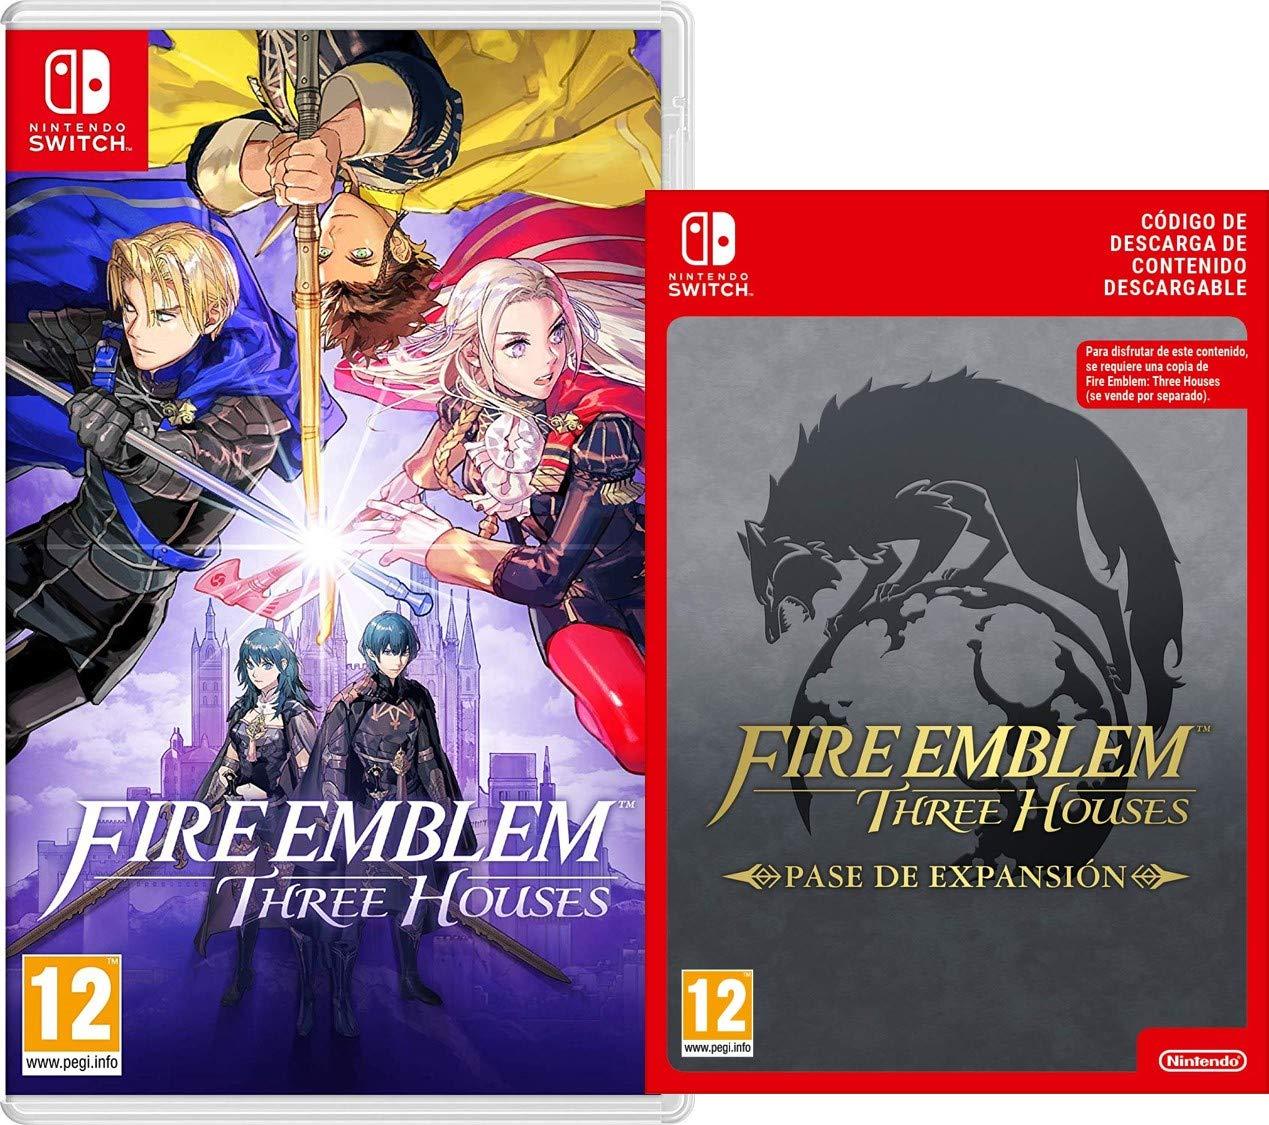 Fire Emblem: Three Houses [Nintendo Switch] + Pase de Expansión [Switch Download Code]: Amazon.es: Videojuegos